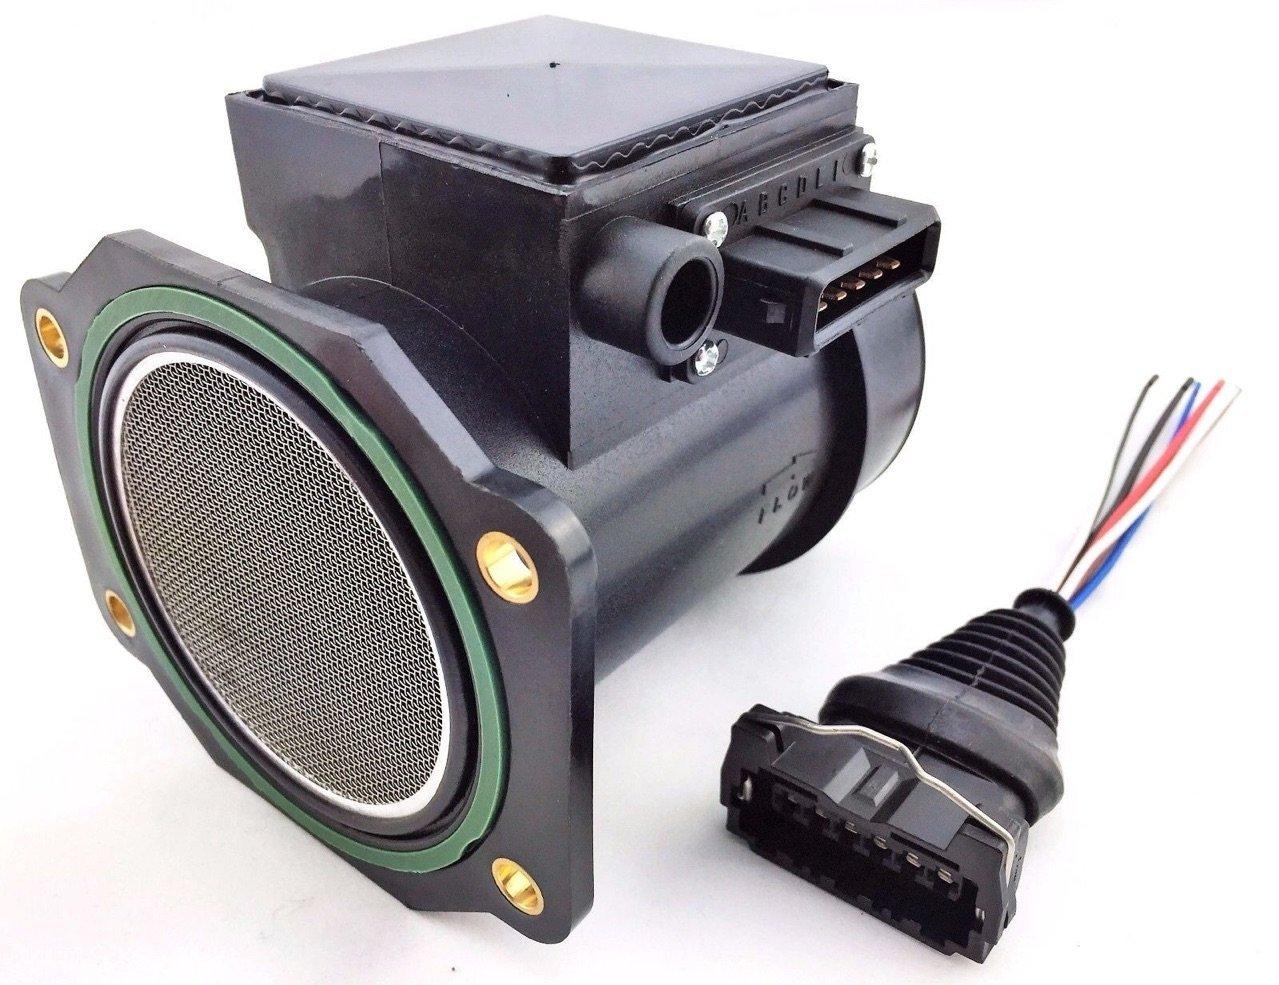 NISSAN 300ZX INFINITI 90-96 J30 3.0L Mass Air Flow Meter Sensor with Wire Harness - 80MM AFM MAF UPGRADE 180SX 200SX 240SX SILVIA SKYLINE Napol Performance